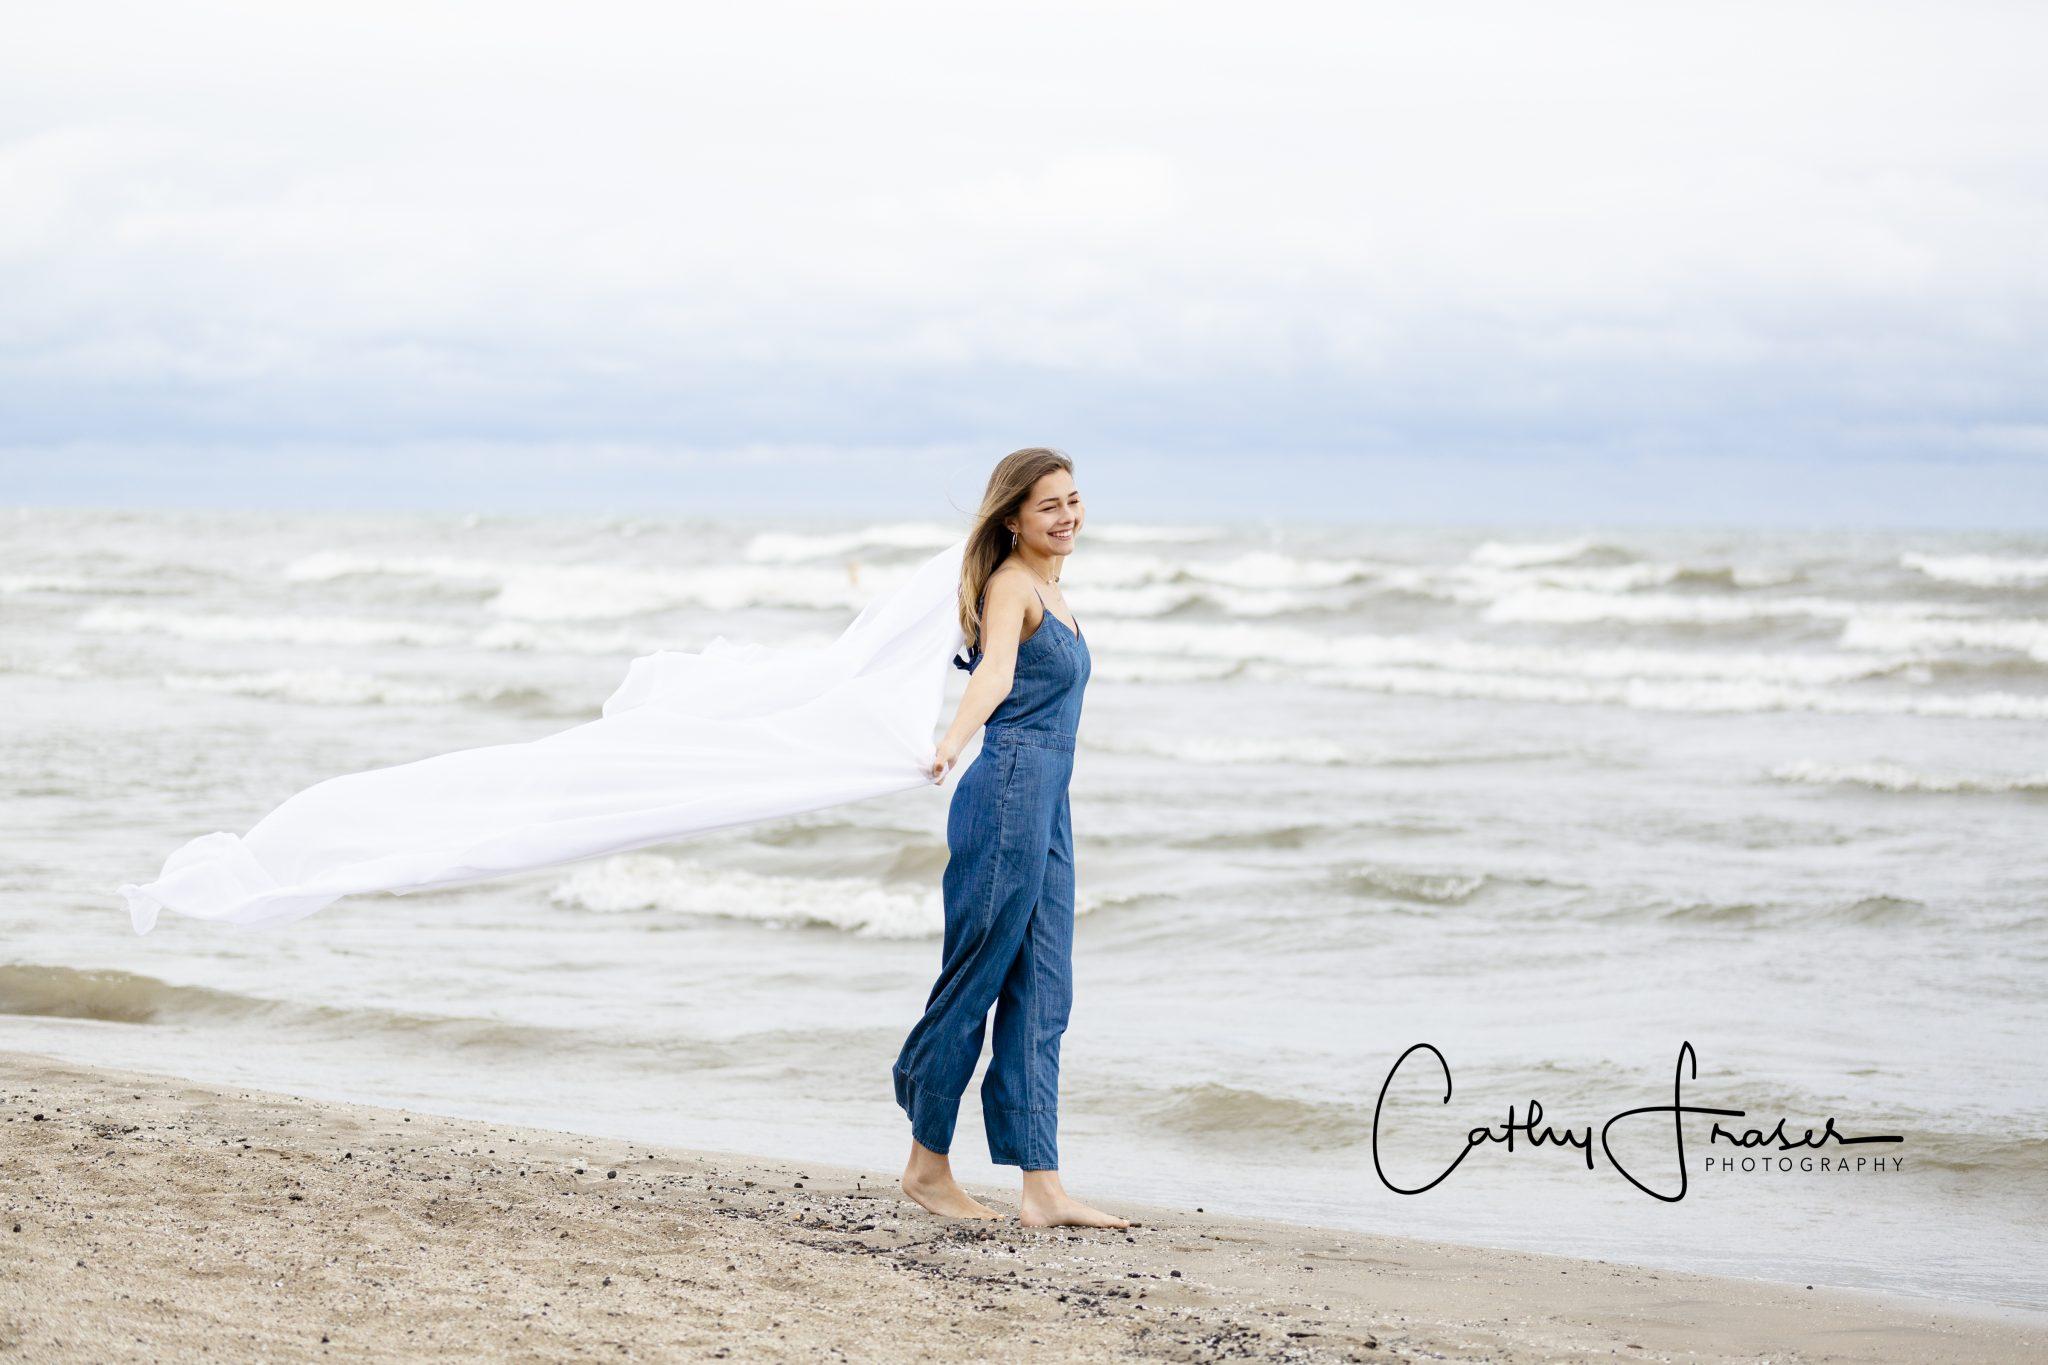 Rochester, New York, Charlotte Beach, Ontario Beach State Park, Charlotte Pier, Great Lakes, blue demin